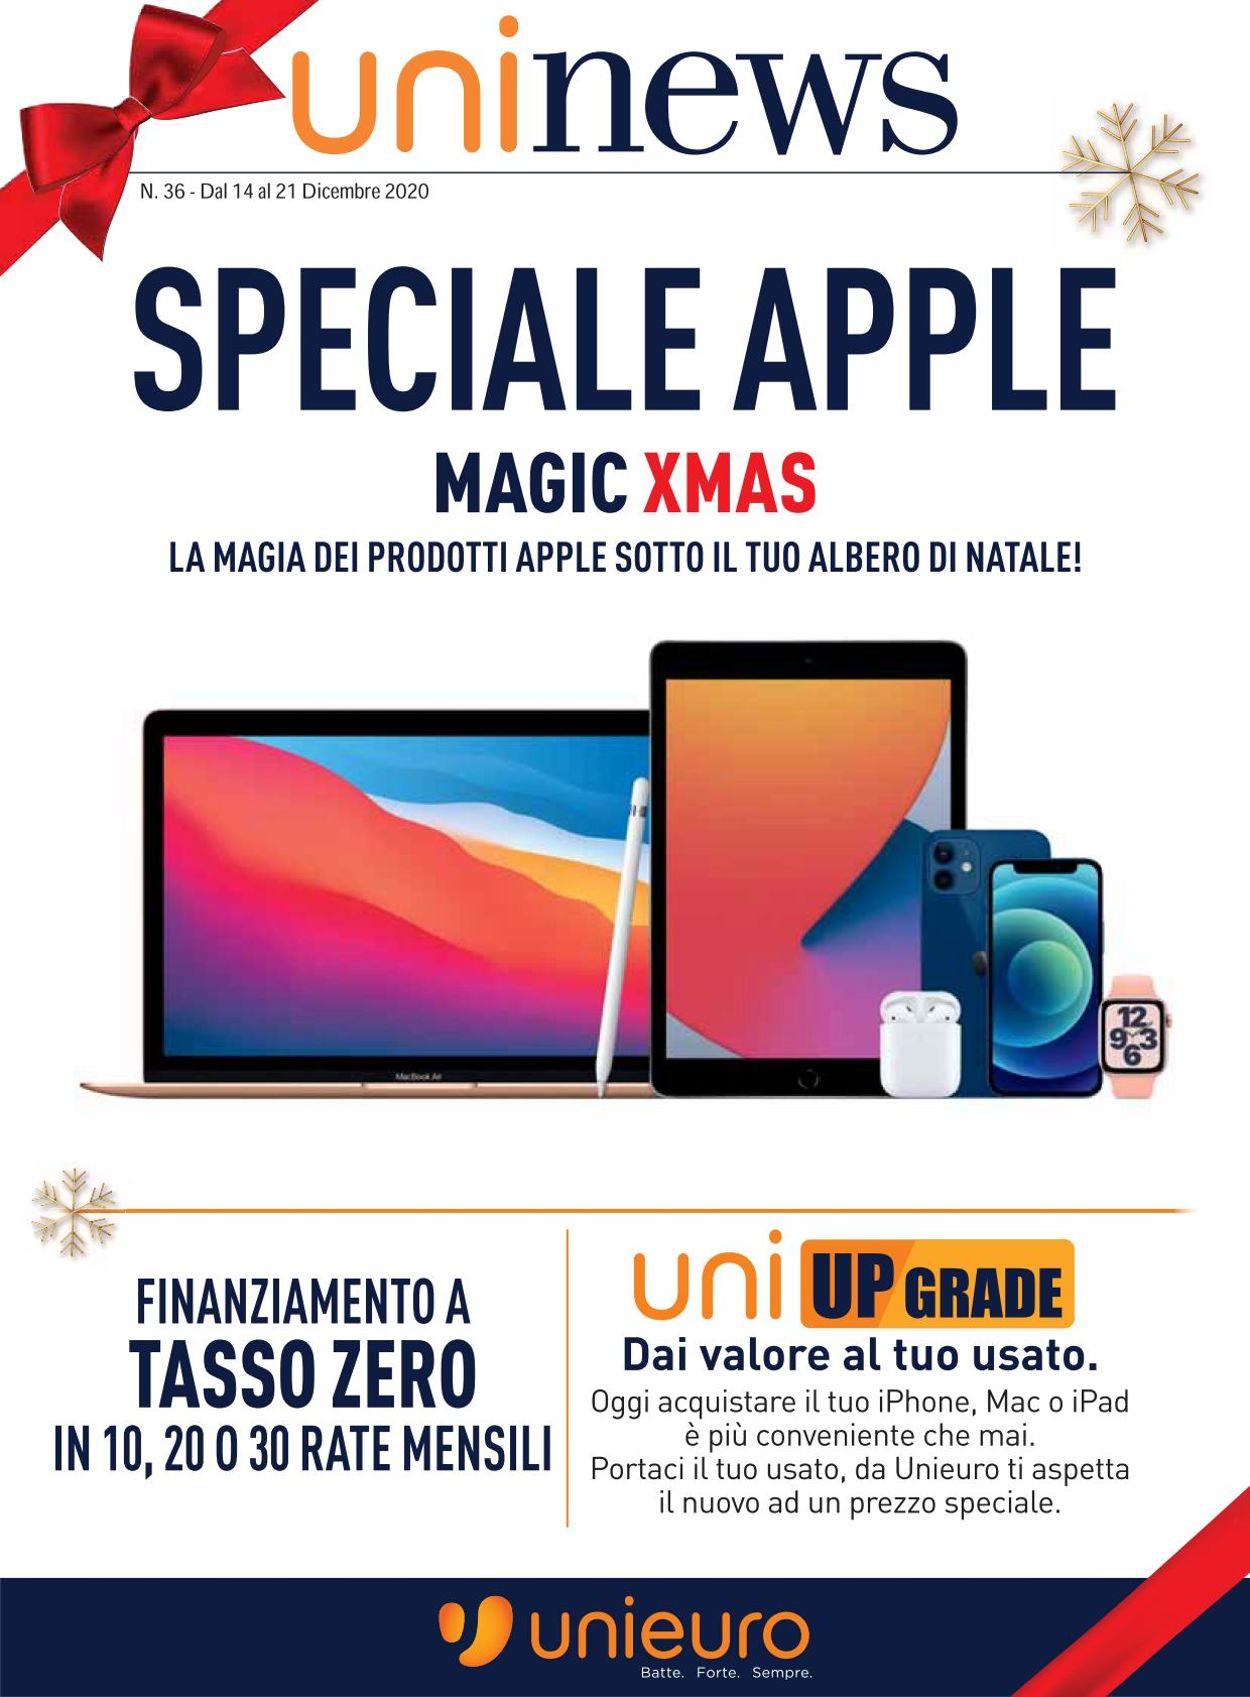 Volantino Unieuro - Apple Magix Xmas 2020 - Offerte 14/12-21/12/2020